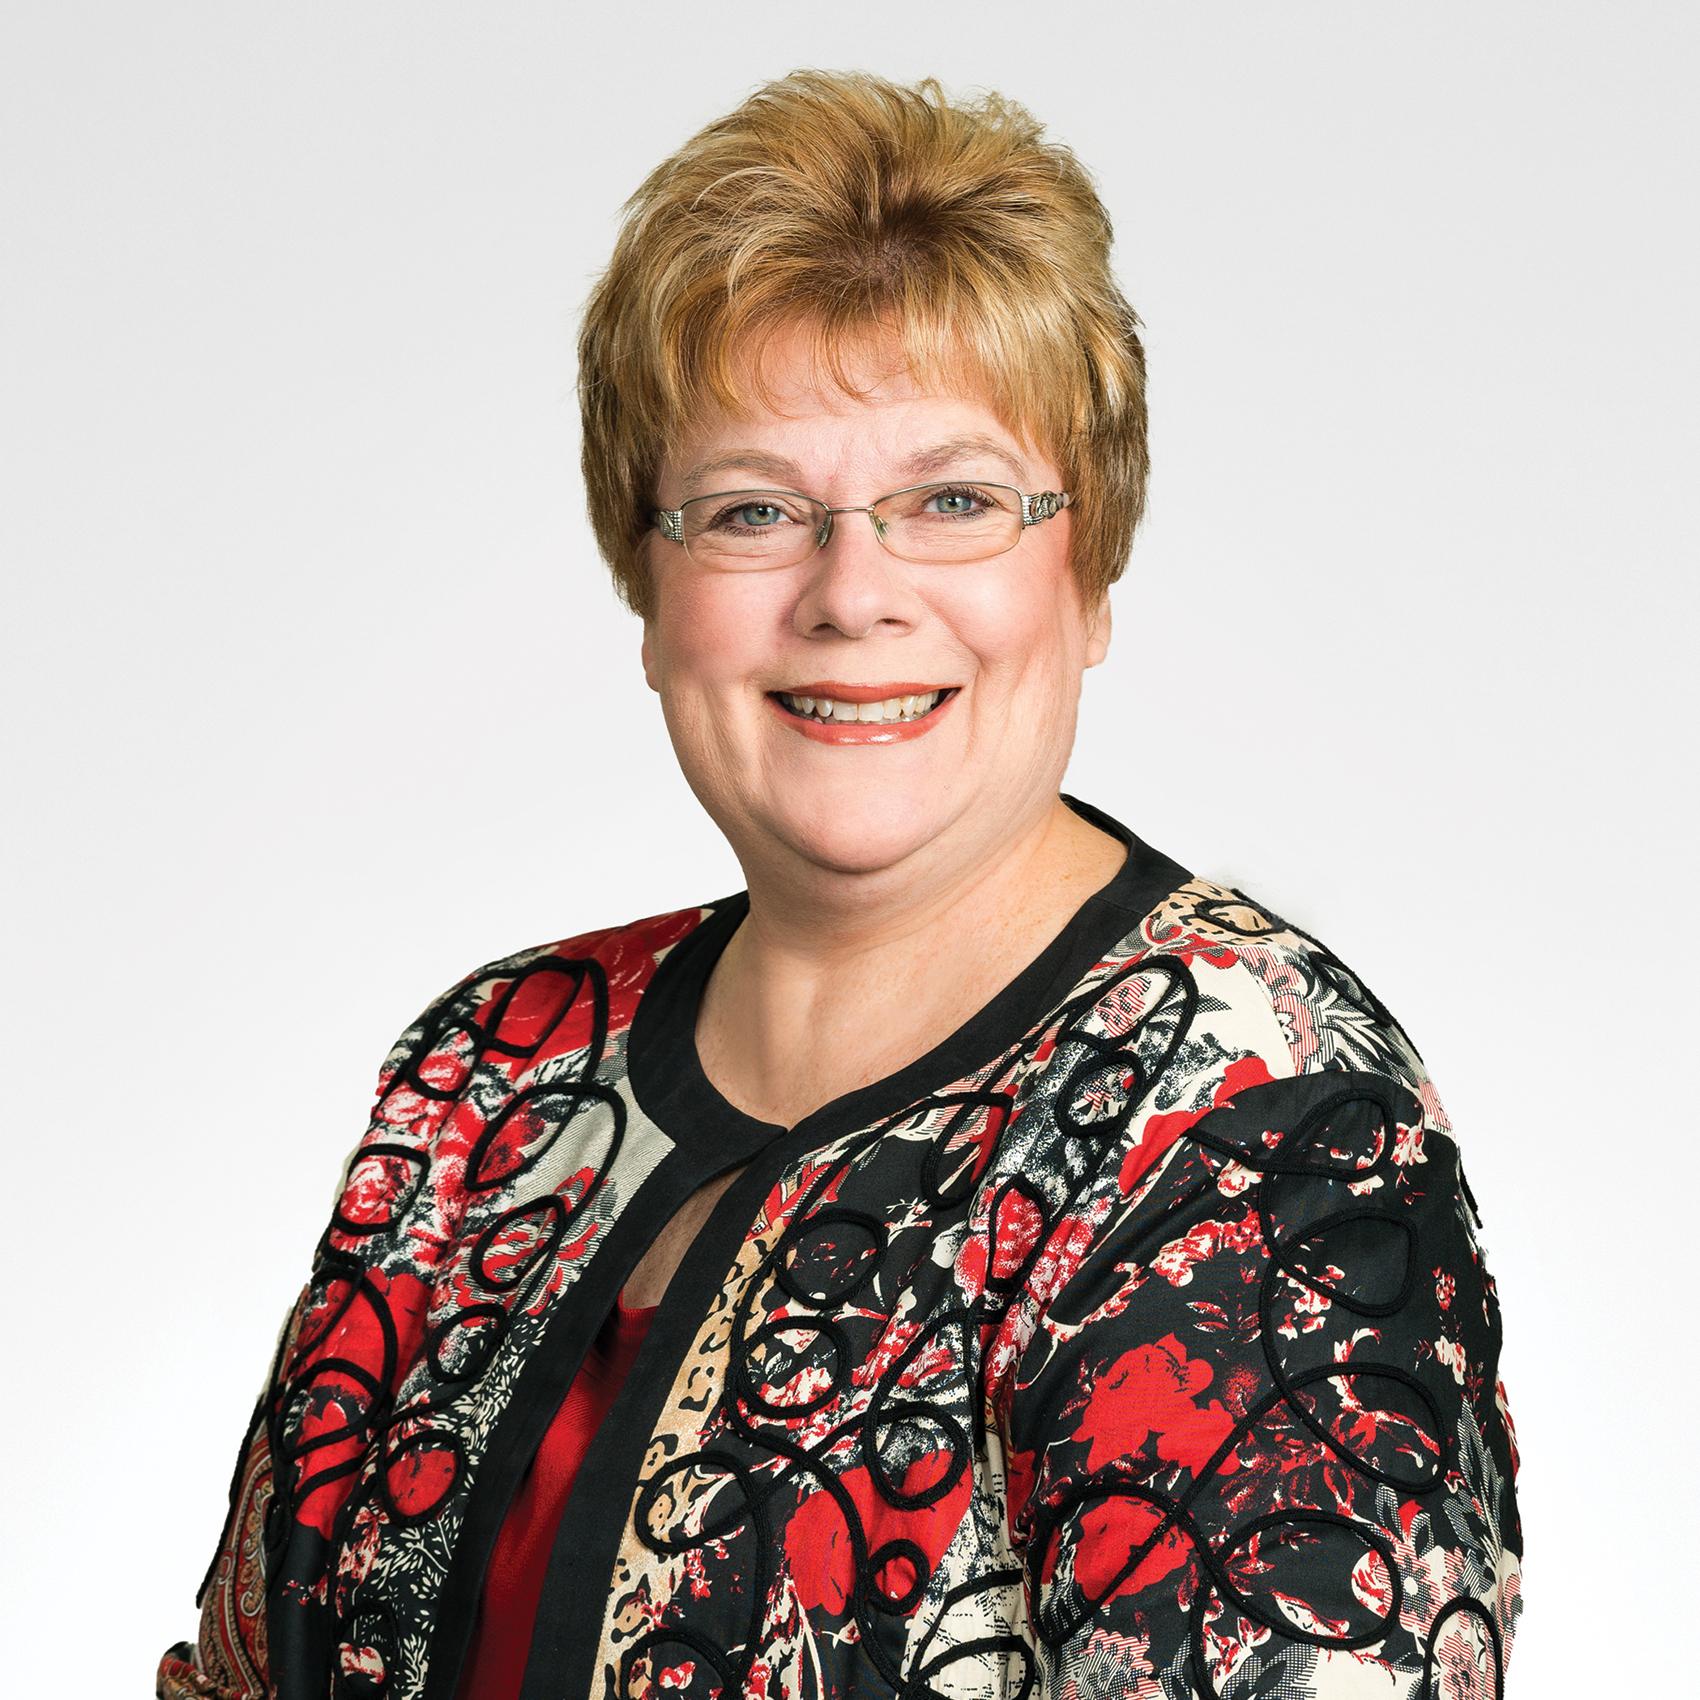 Kristine Seymour # Michael Best Strategies